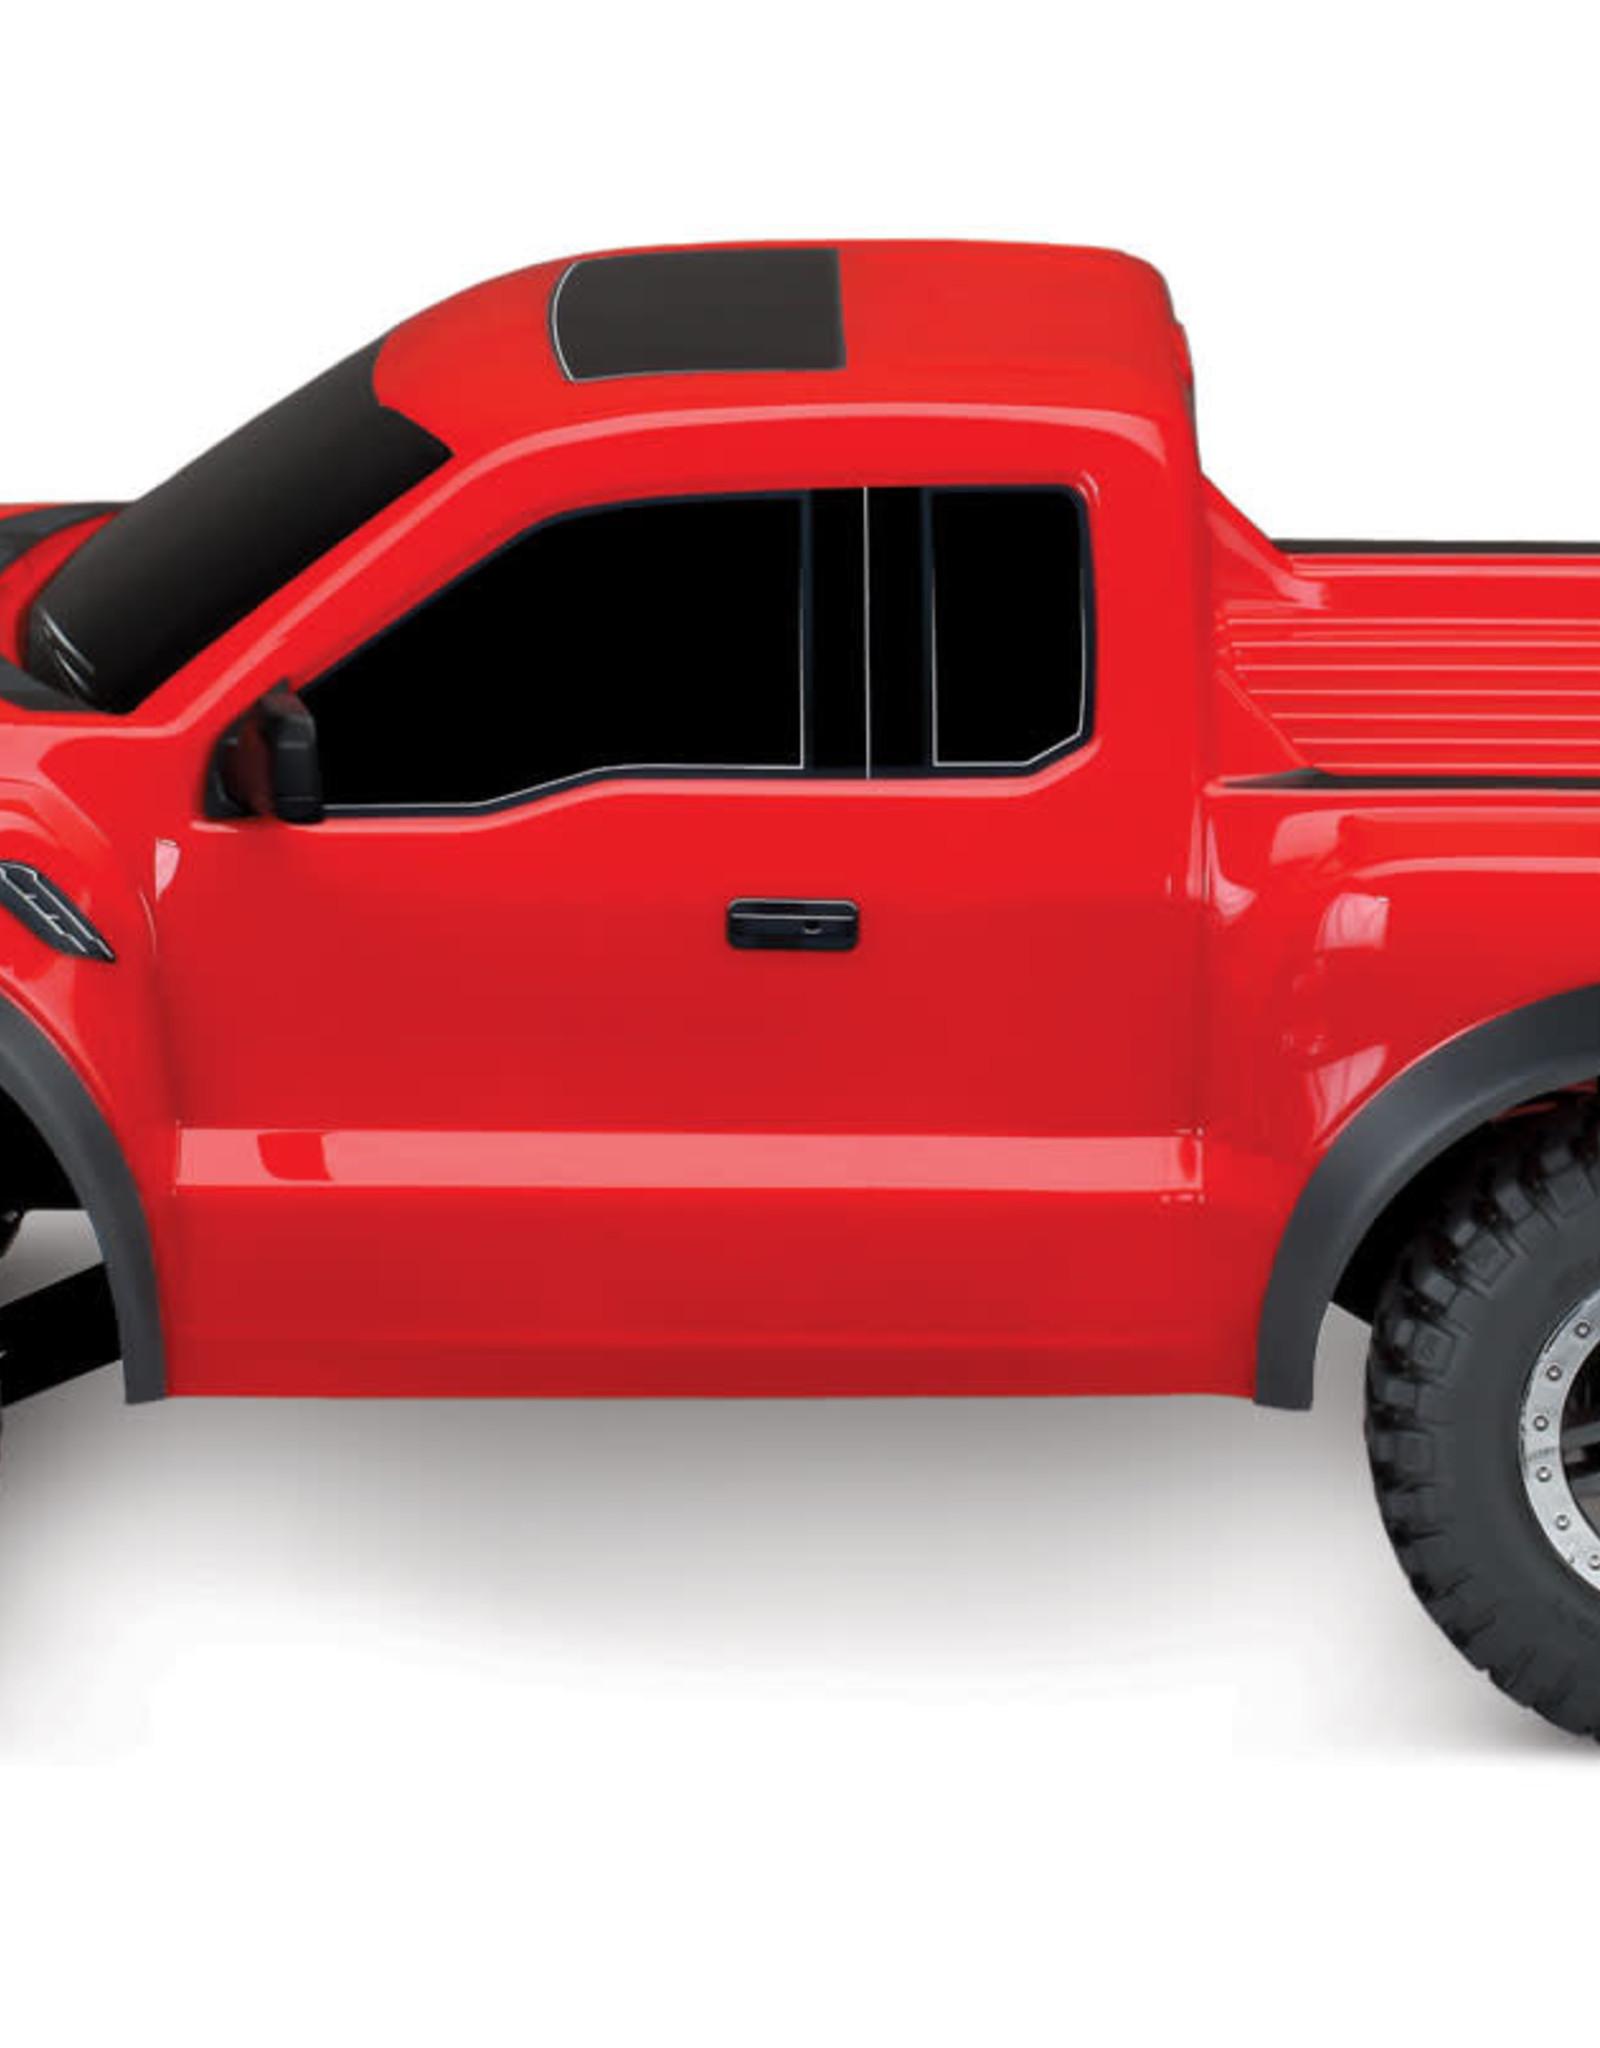 Traxxas TRA58094-1 Red Ford Raptor RTR Slash 1/10 2WD Truck